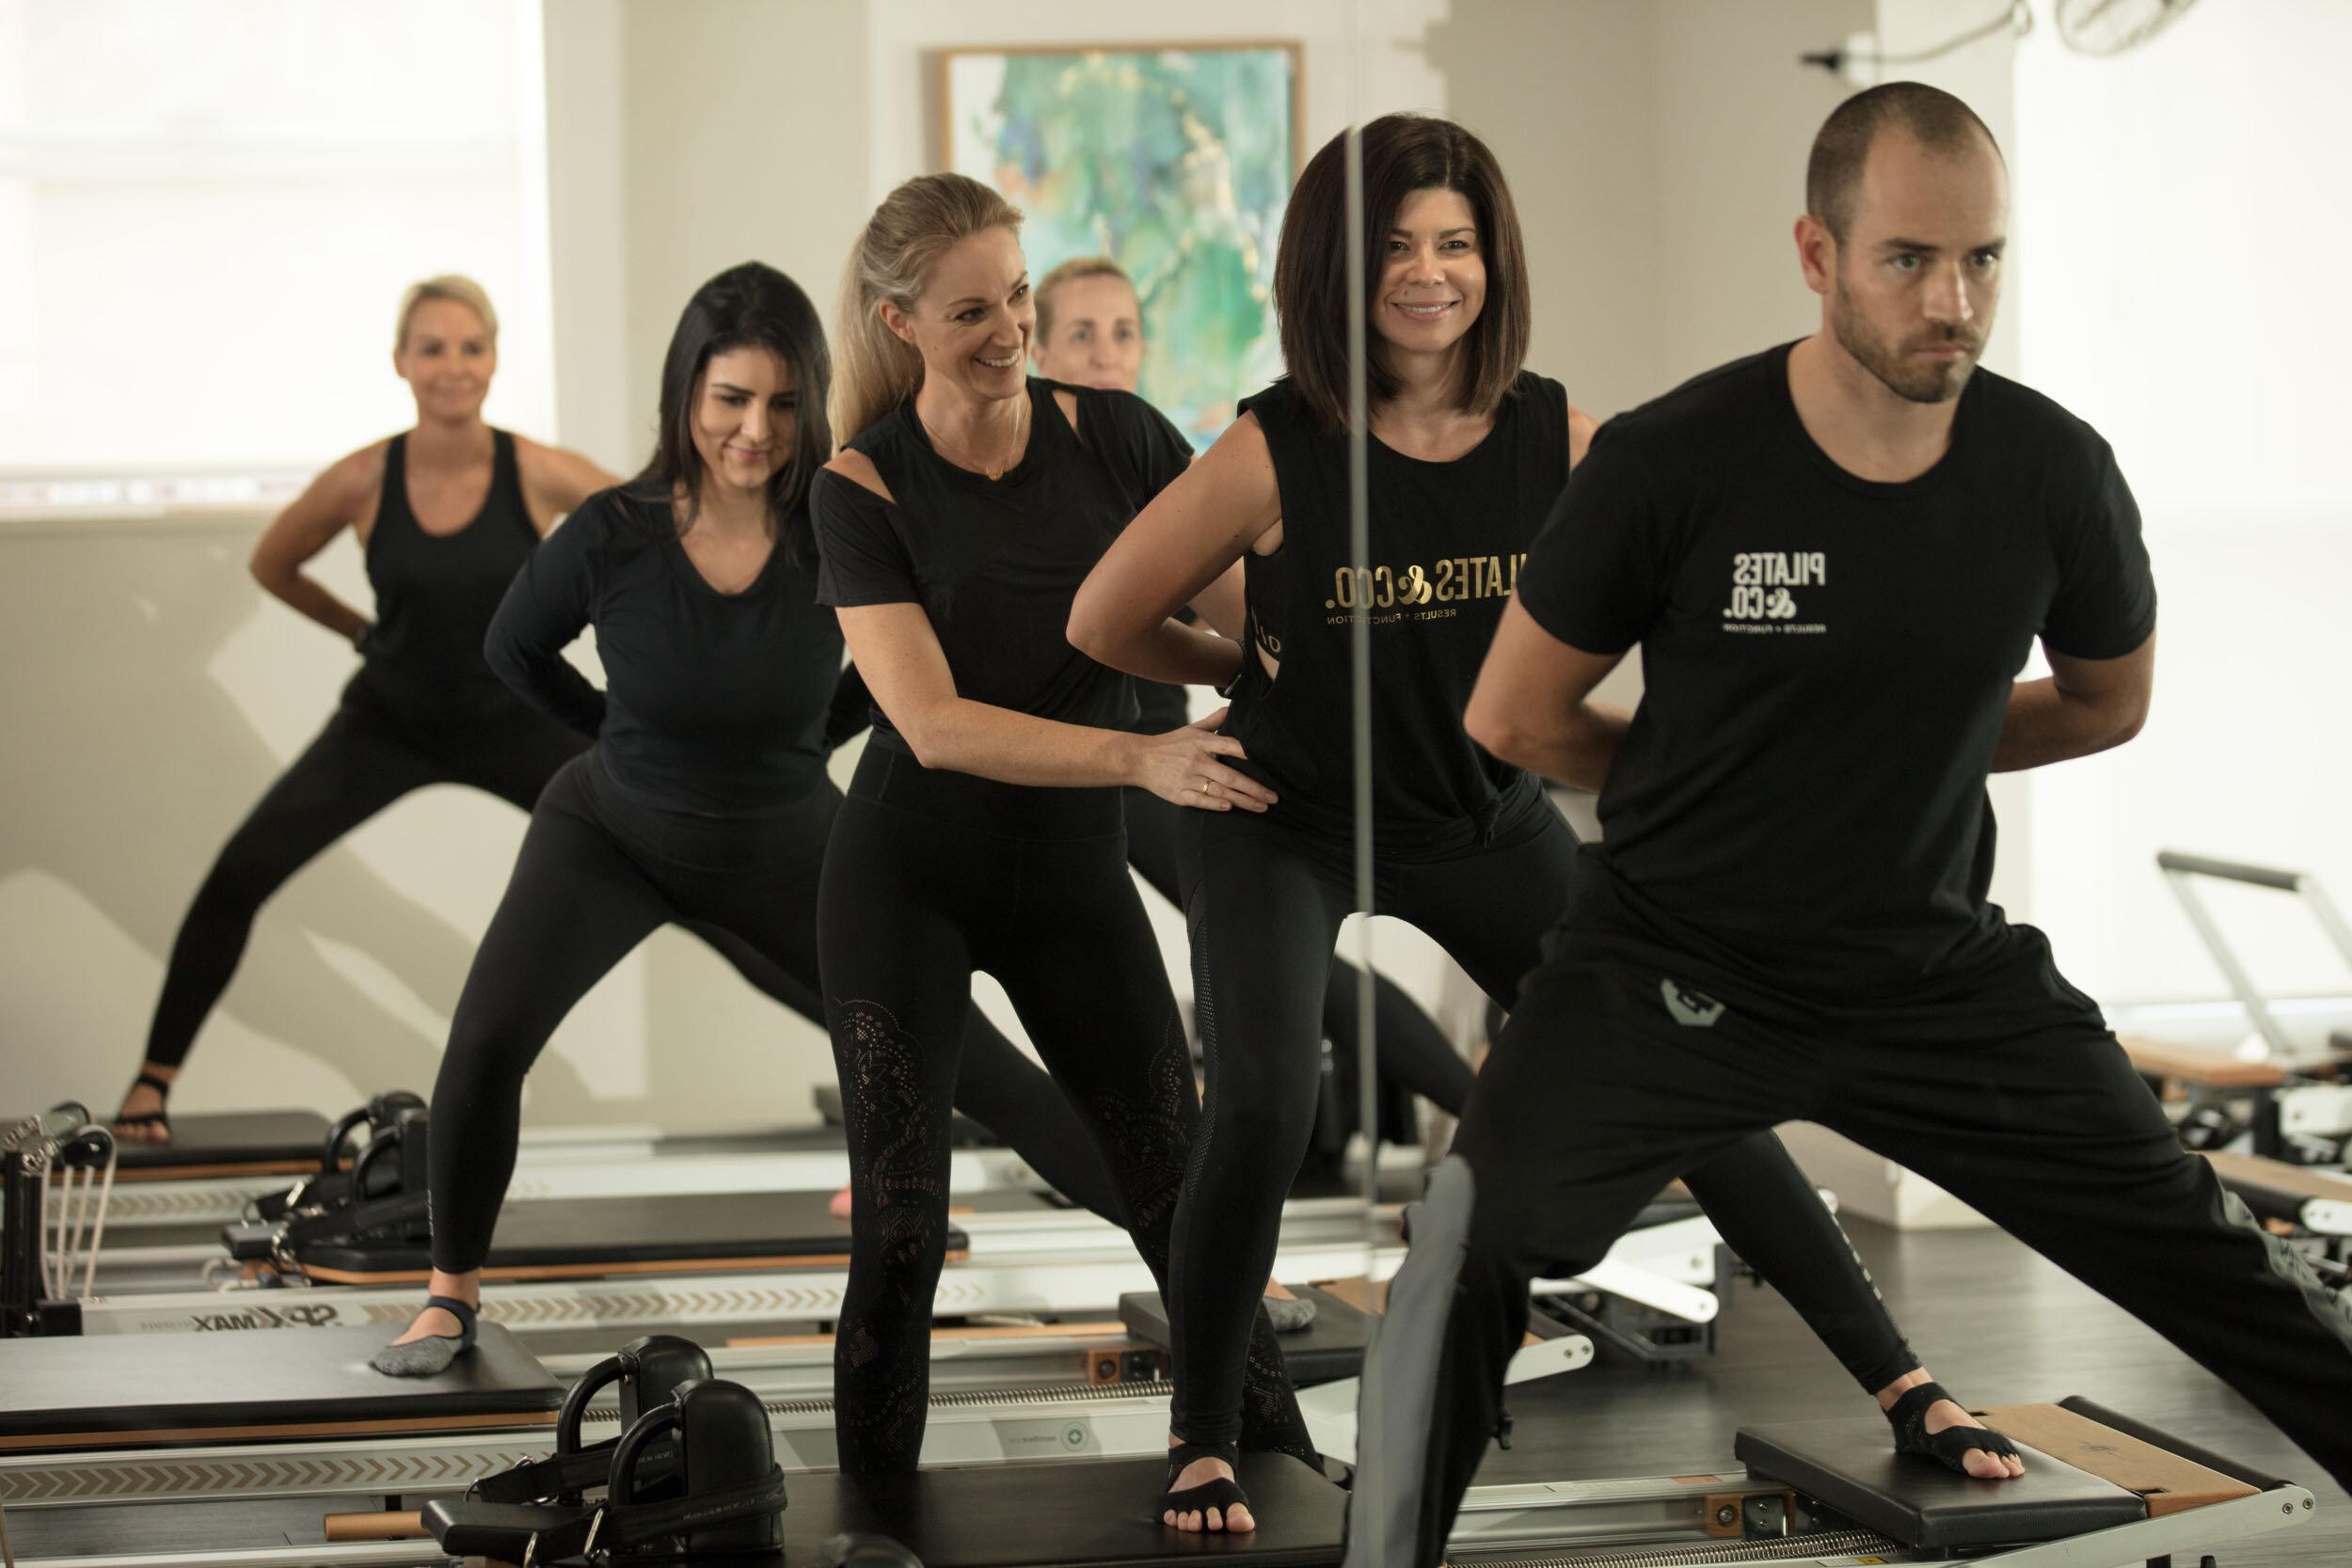 Pilates and Co Pilates Reformer Burleigh Miami 14.jpg